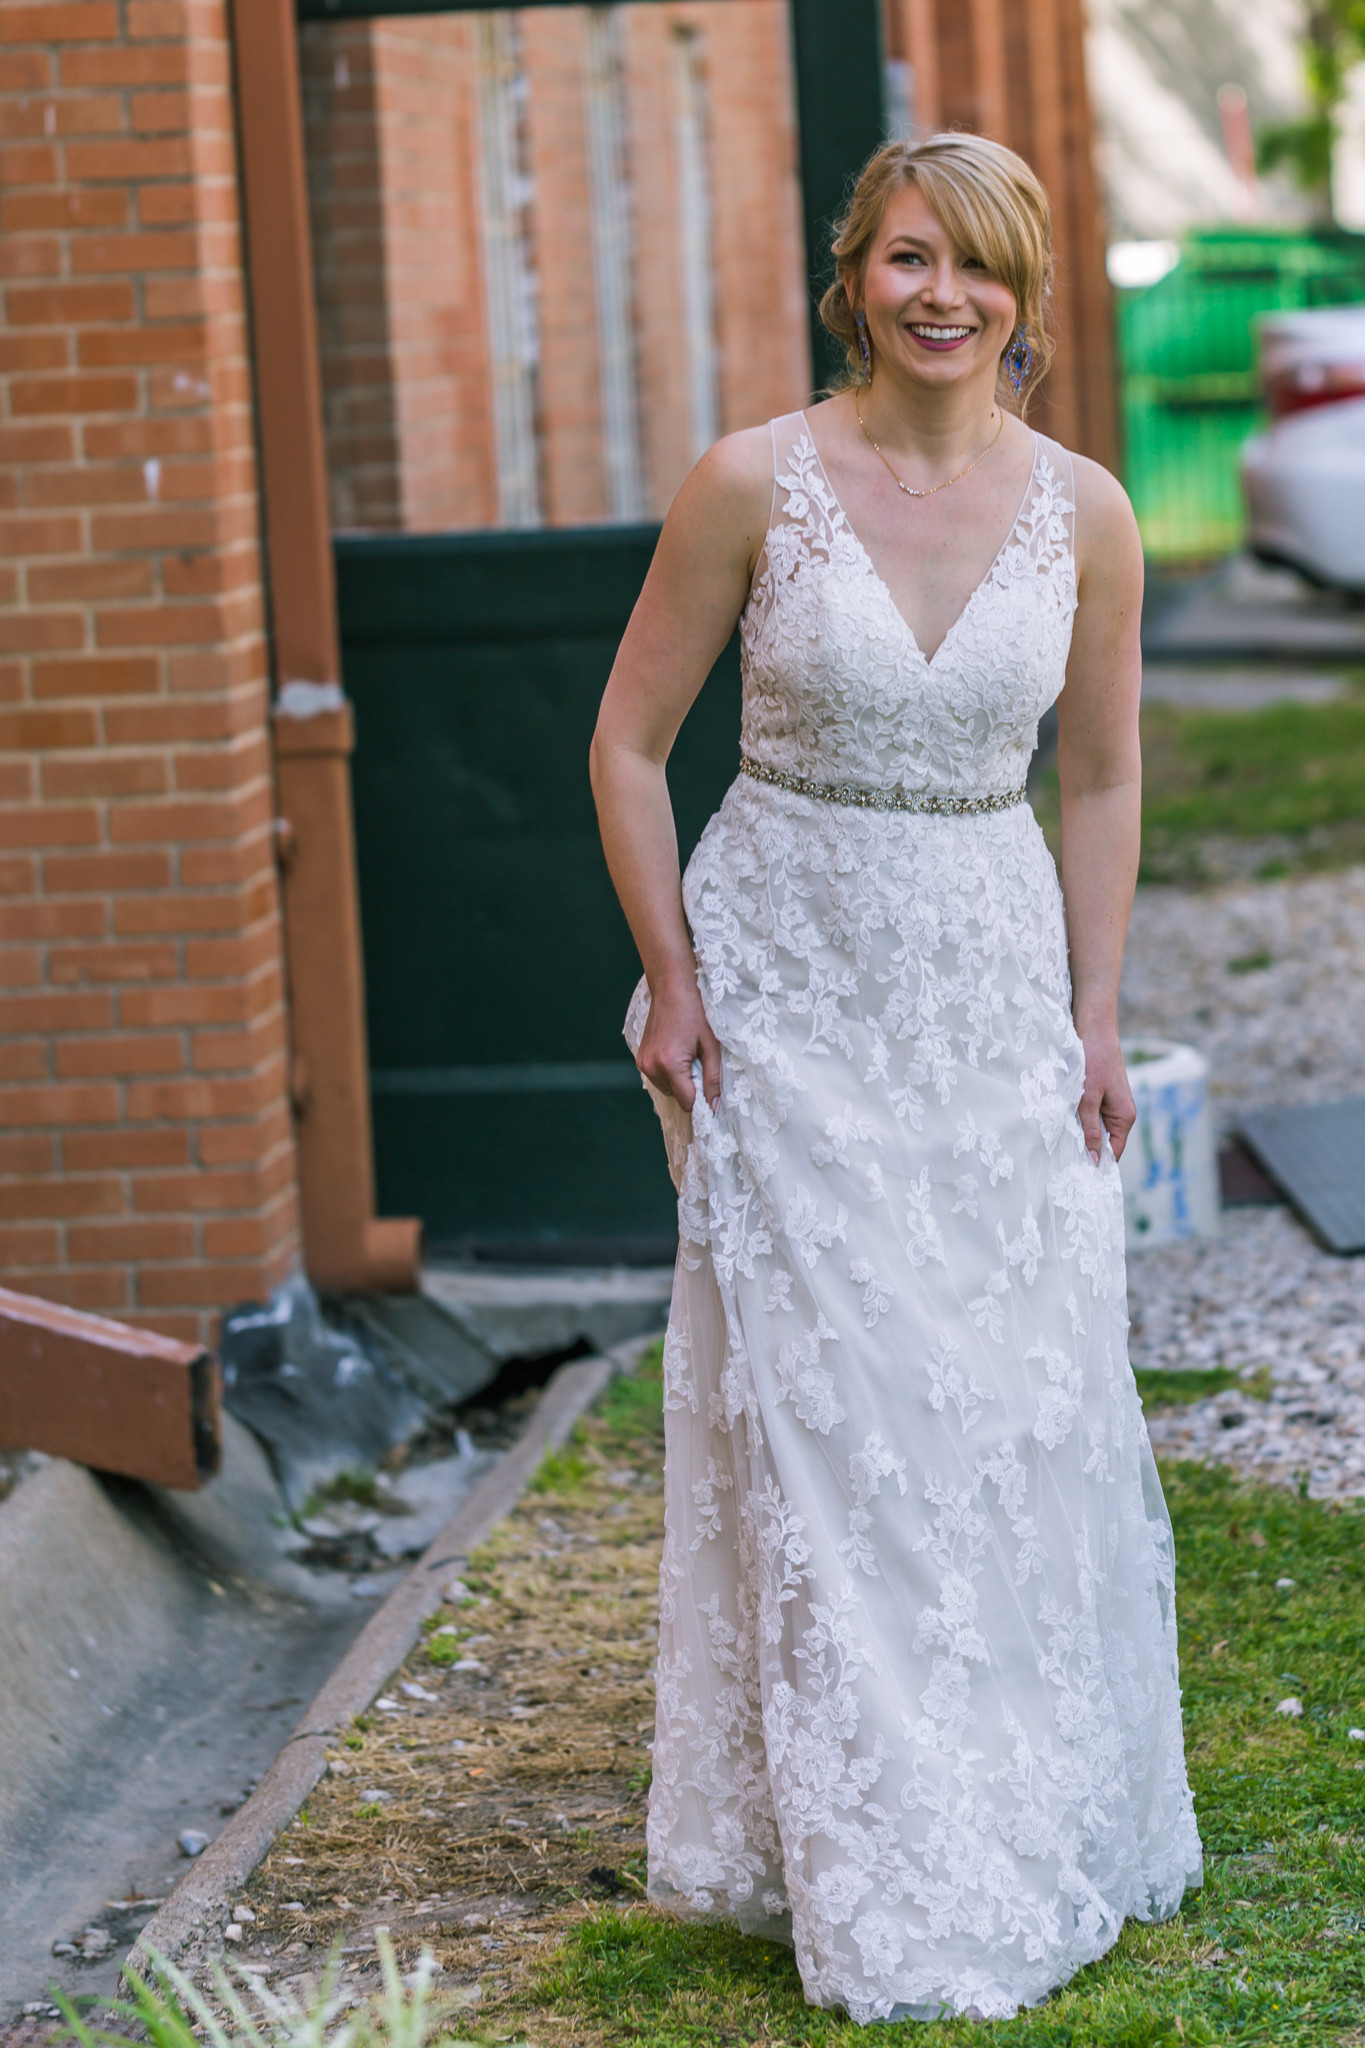 Jessica-Nat-Wedding-PhotoKumar (23 of 33).jpg